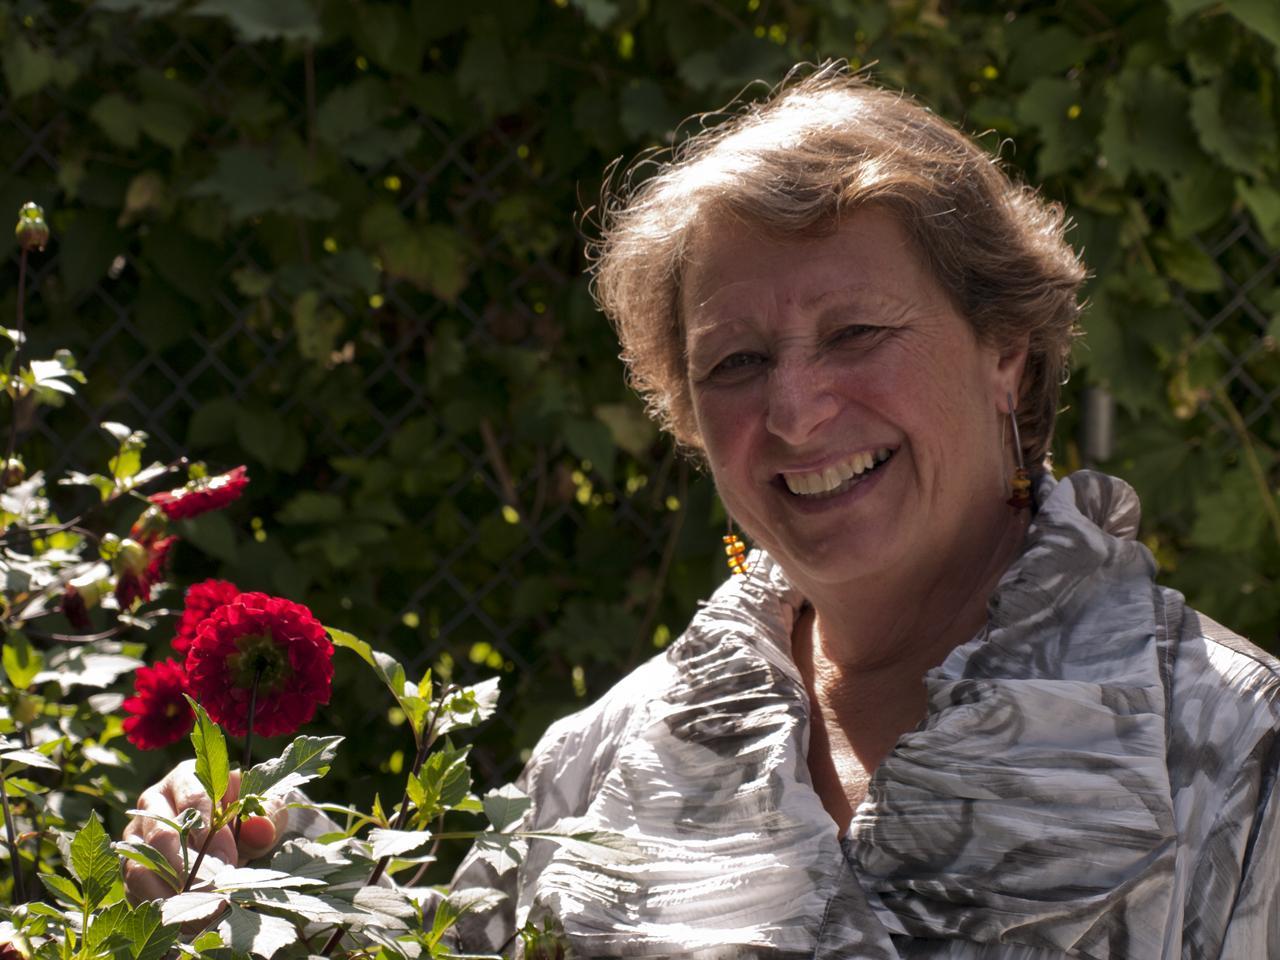 Mary Kritz